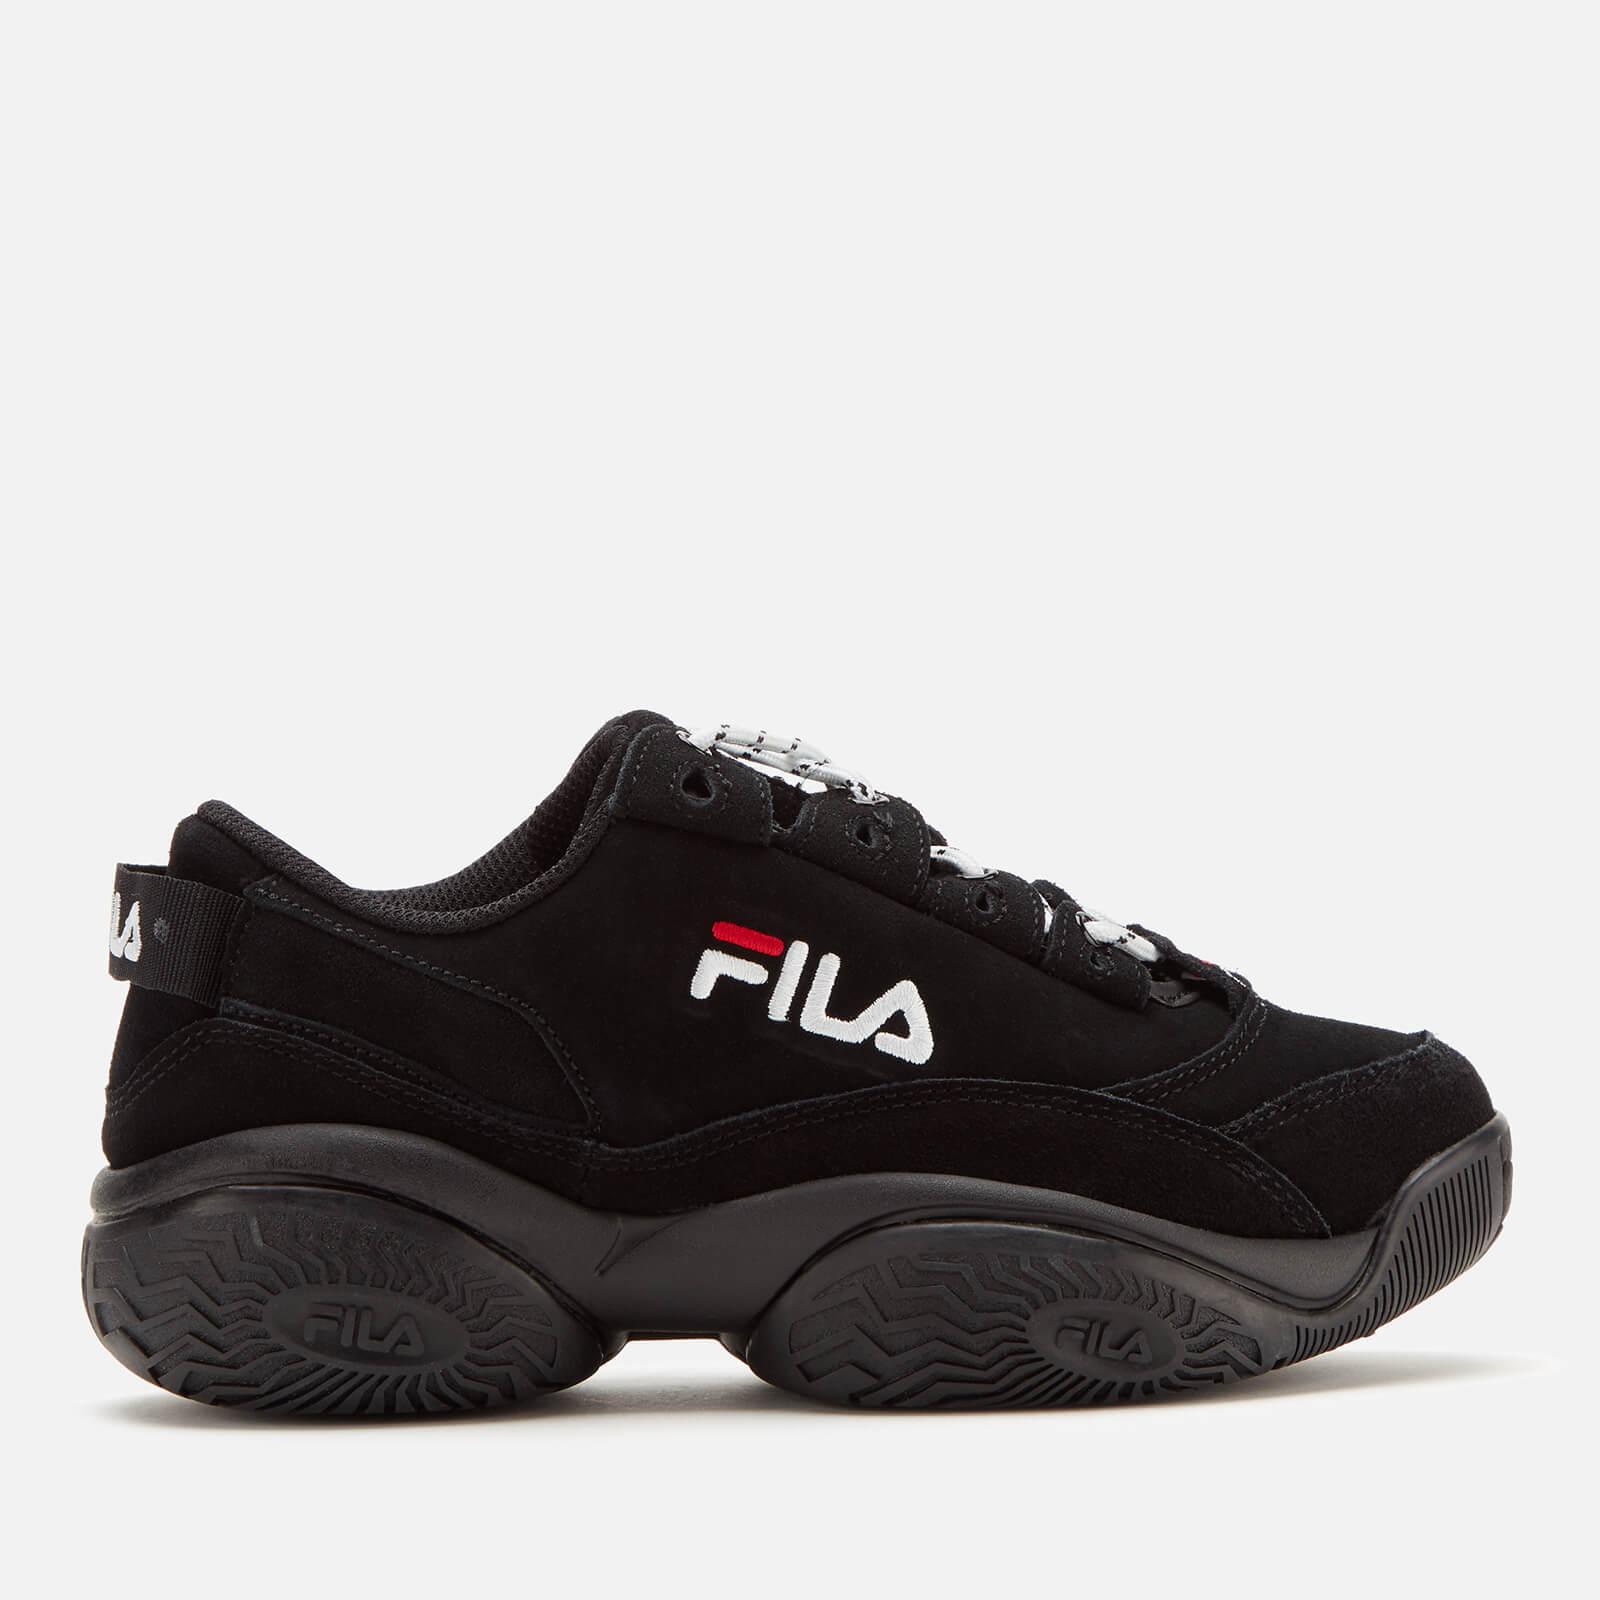 FILA Women's Provenance Trainers - Black/Black/White